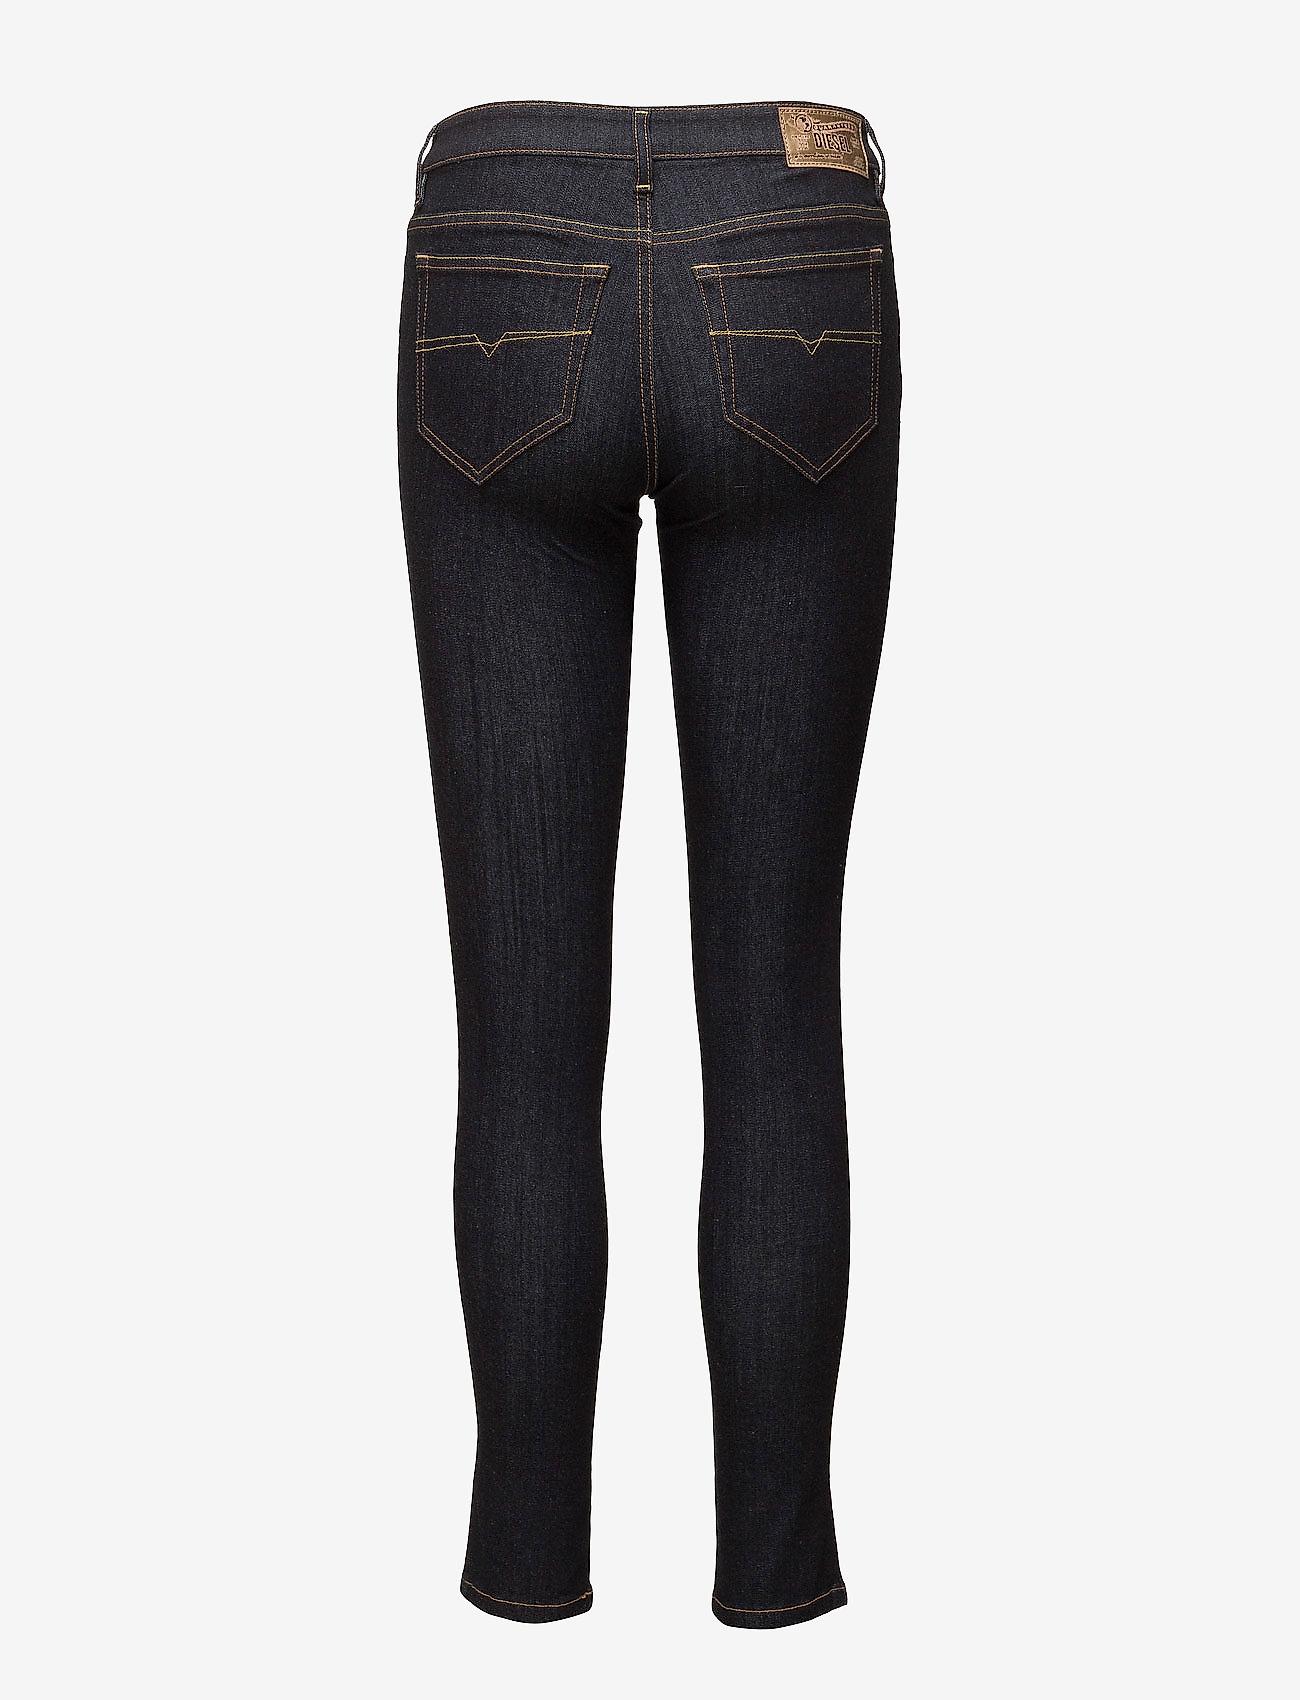 Diesel Women - SKINZEE - skinny jeans - denim